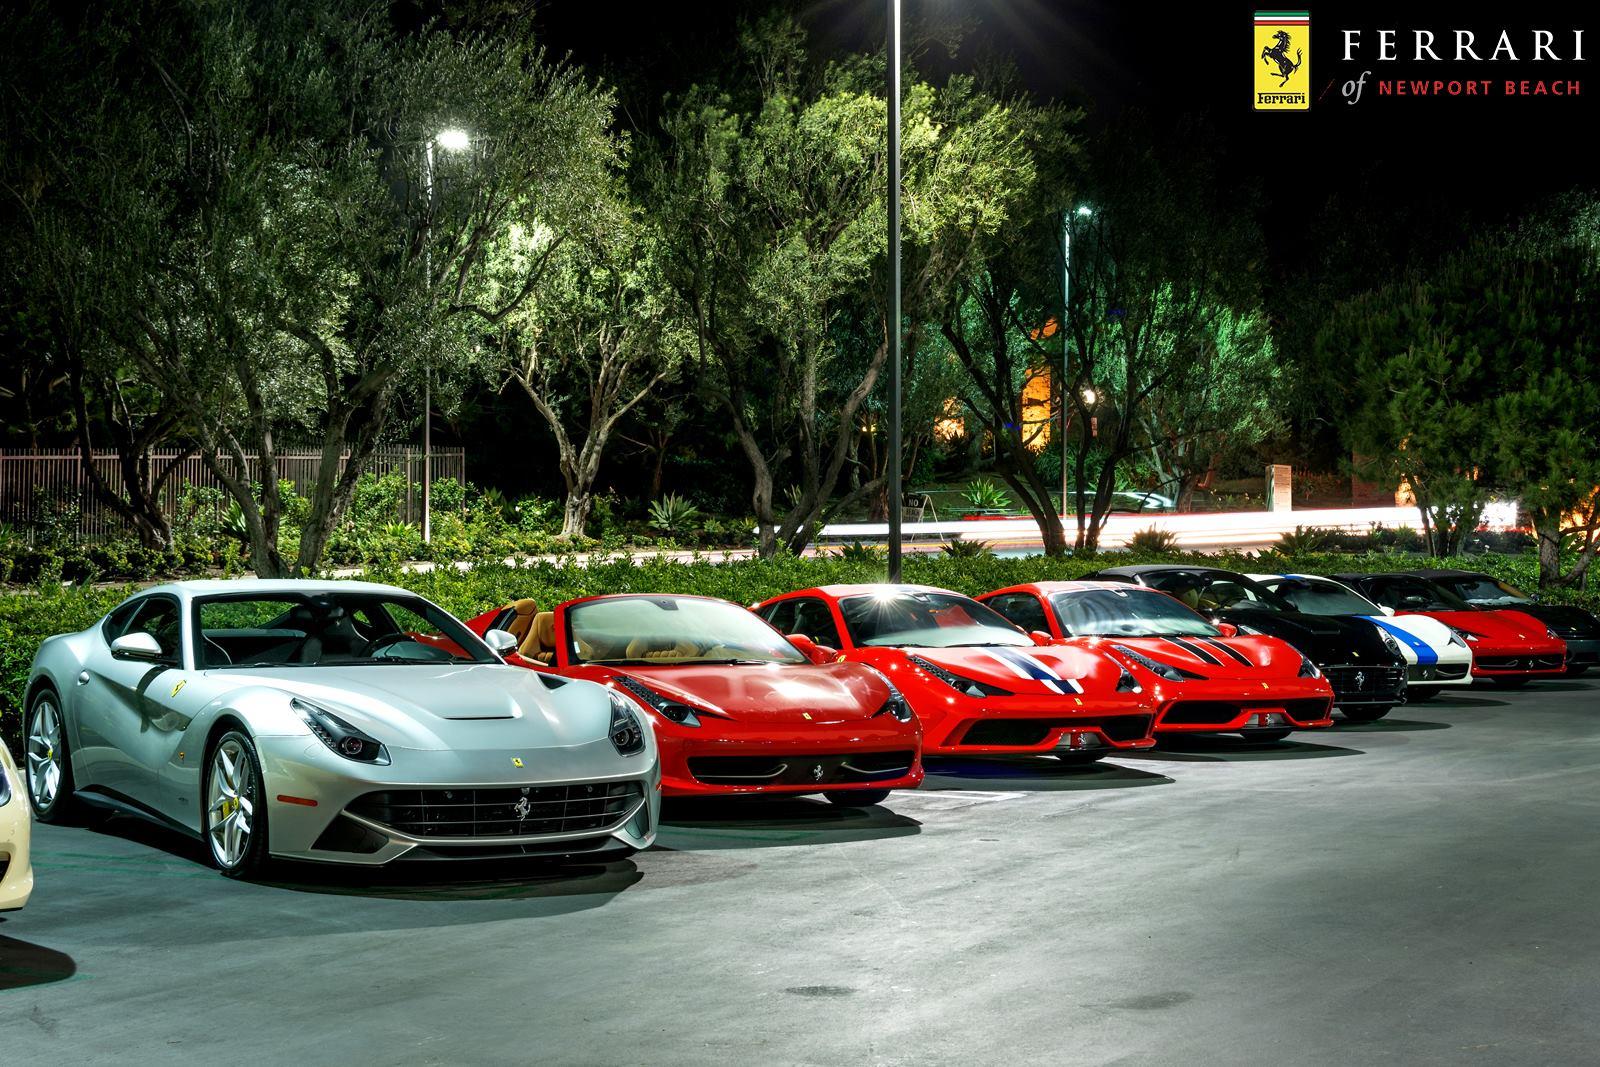 Laferrari Duo Rocks Ferrari Newport Beach Dinner Party Gtspirit